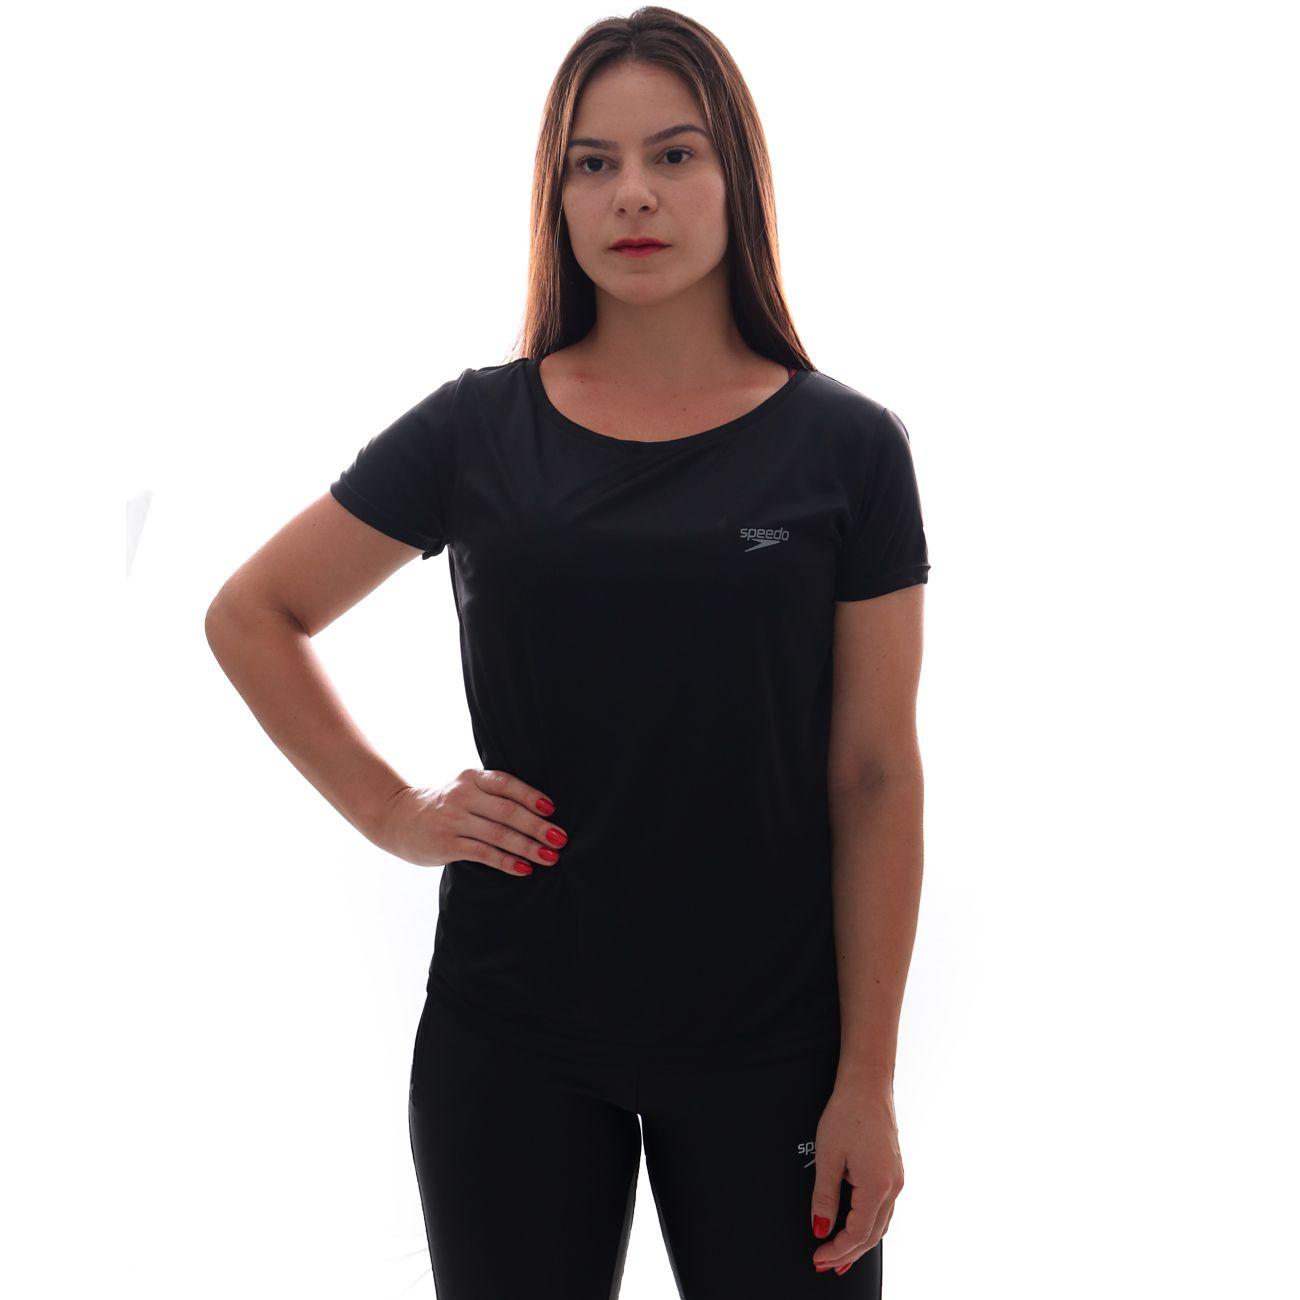 Camiseta Speedo Interlock UV50 Feminina Preto